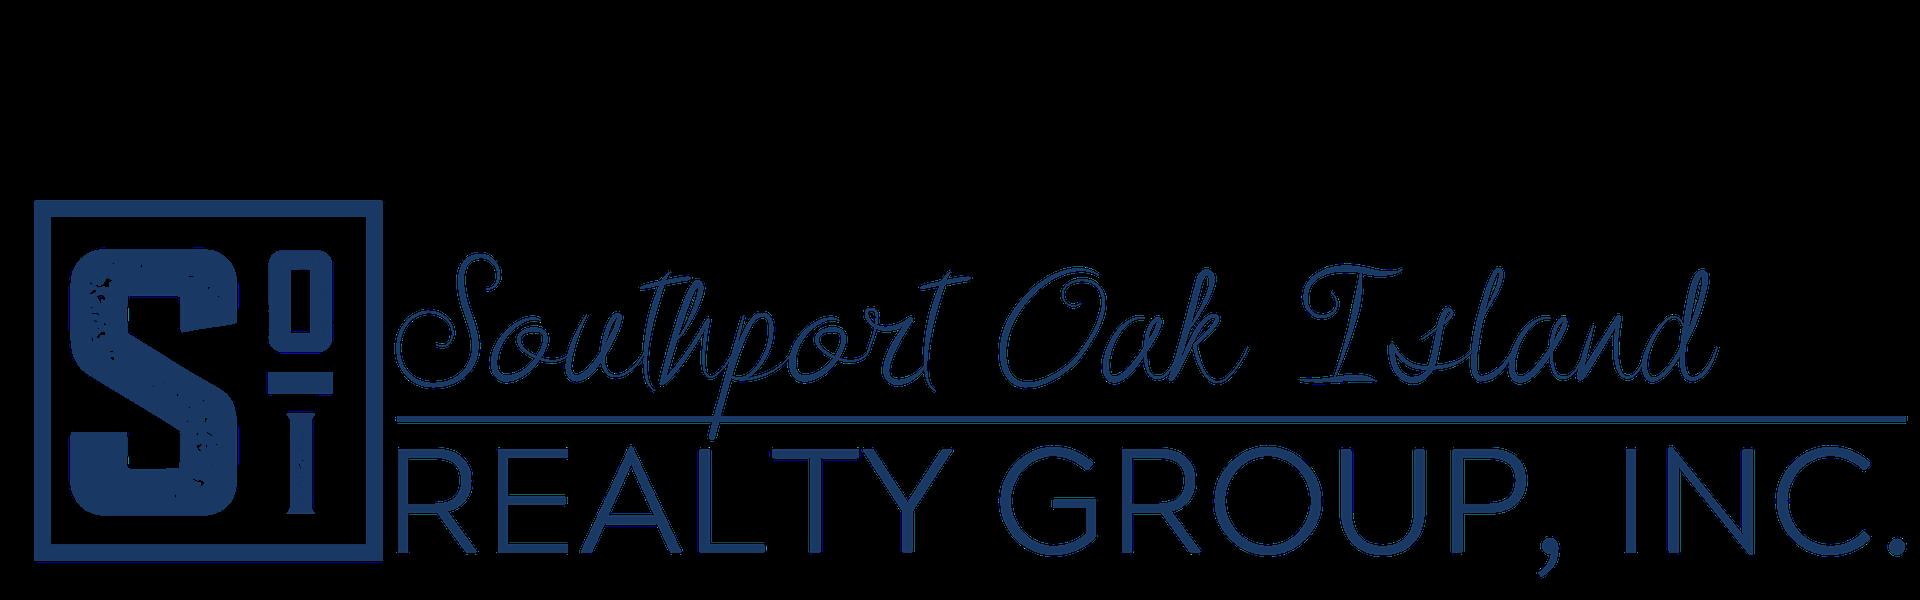 Southport Oak Island Realty Group, Inc.